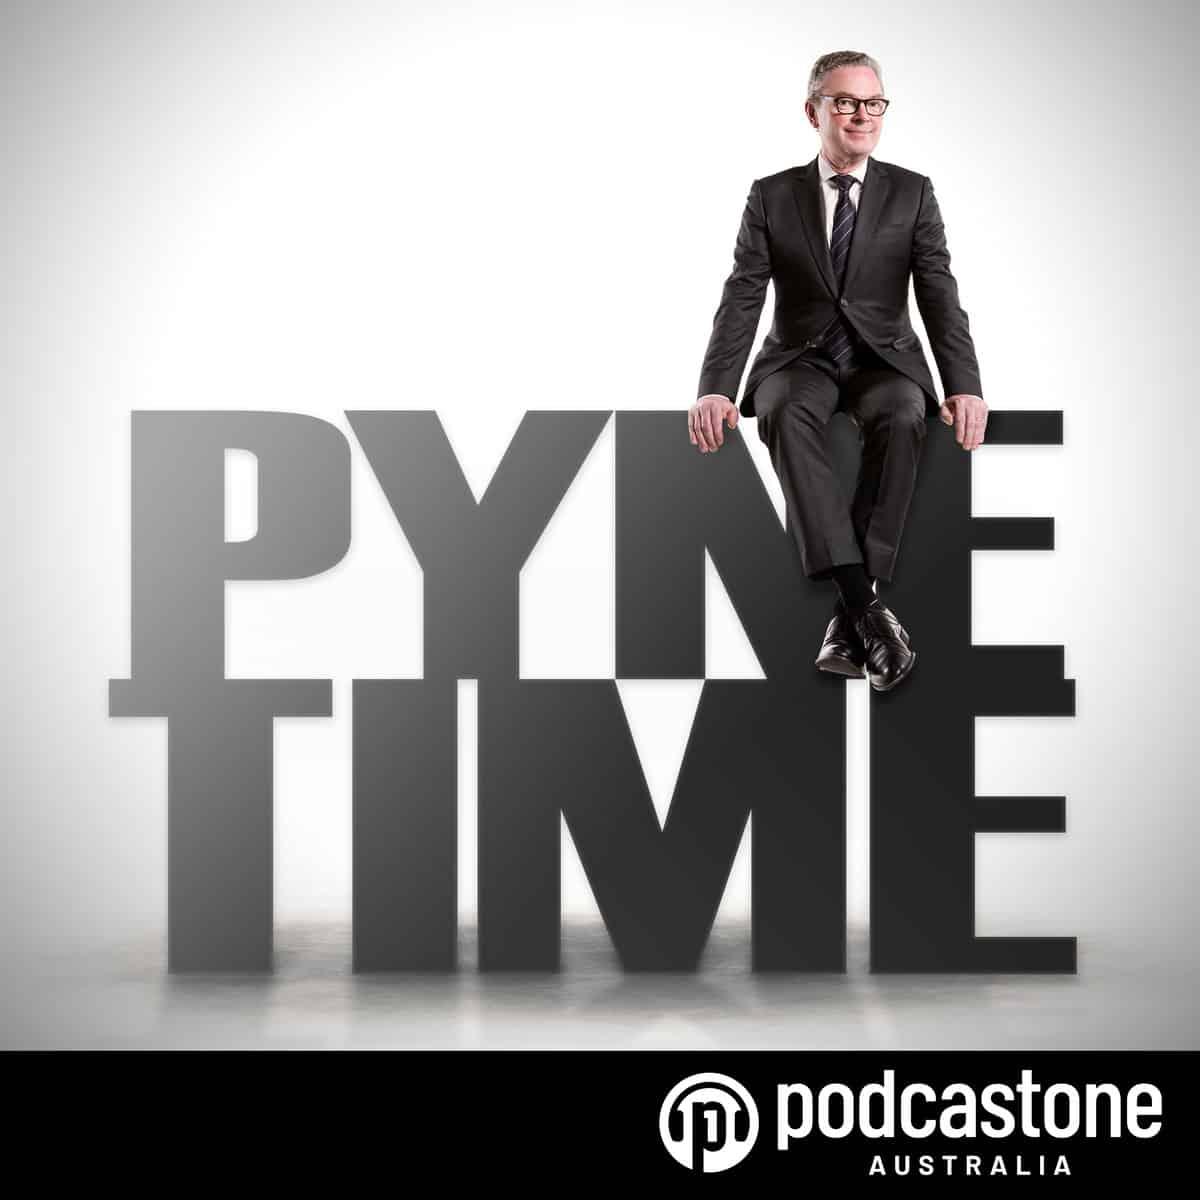 Podcast Week: Pyne Time, ATM Boy movie, iHeartMedia, Wondery